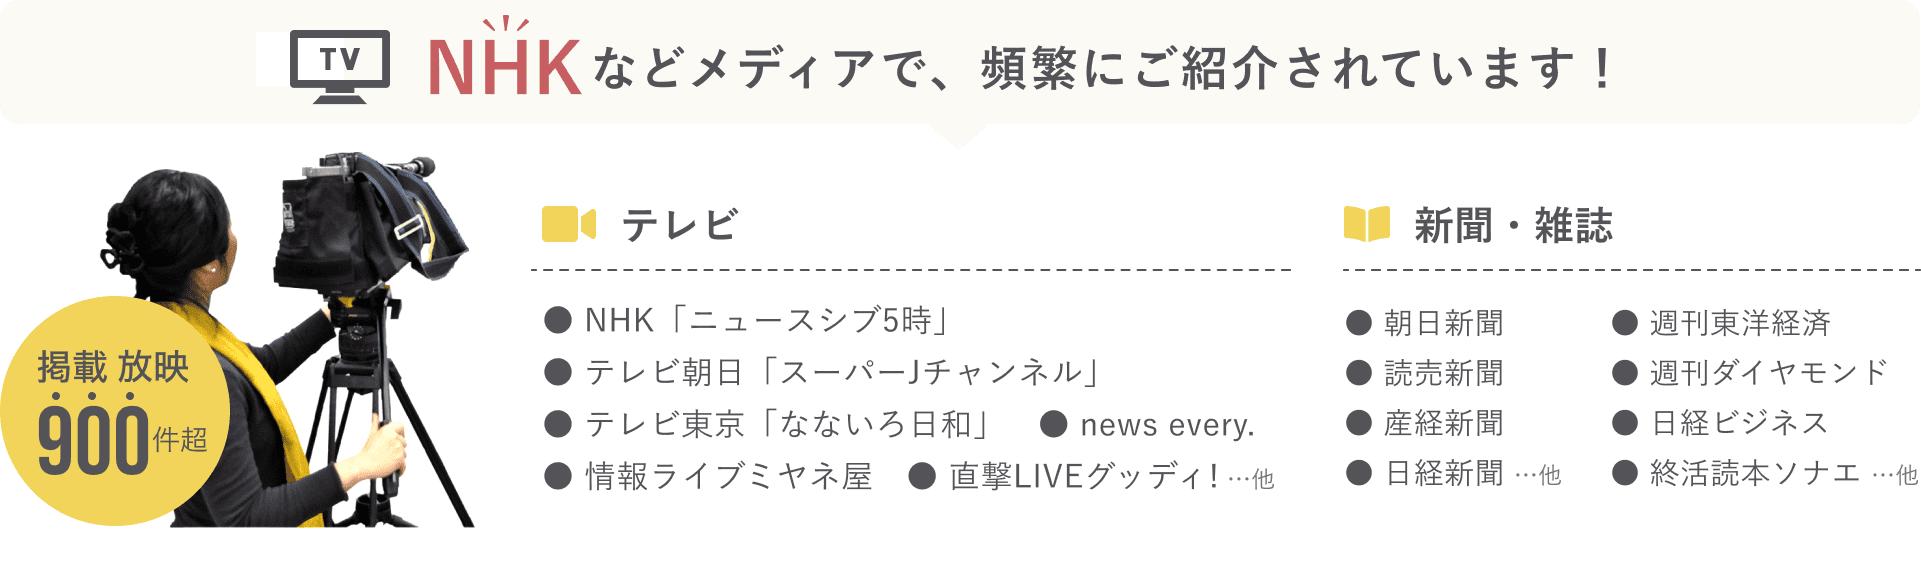 NHKなどのメディアで紹介されました